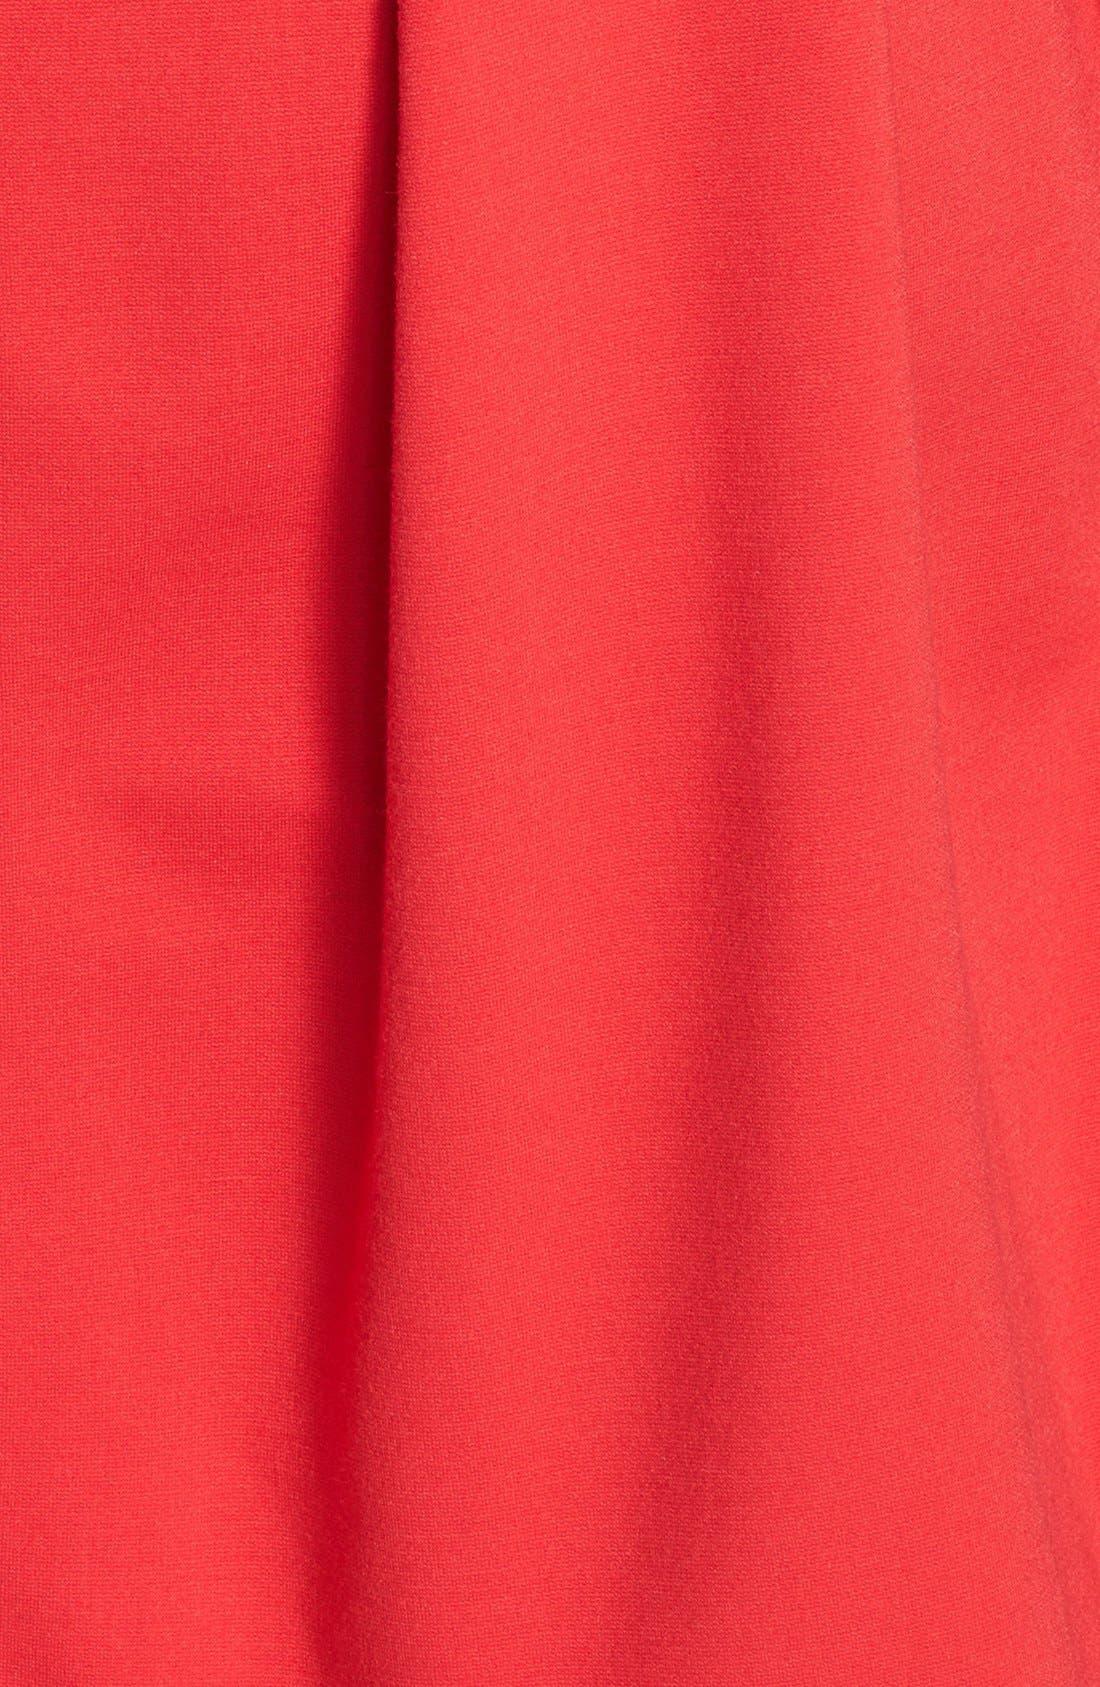 Alternate Image 4  - Eliza J Cutout Back Belted Ponte Knit Fit & Flare Dress